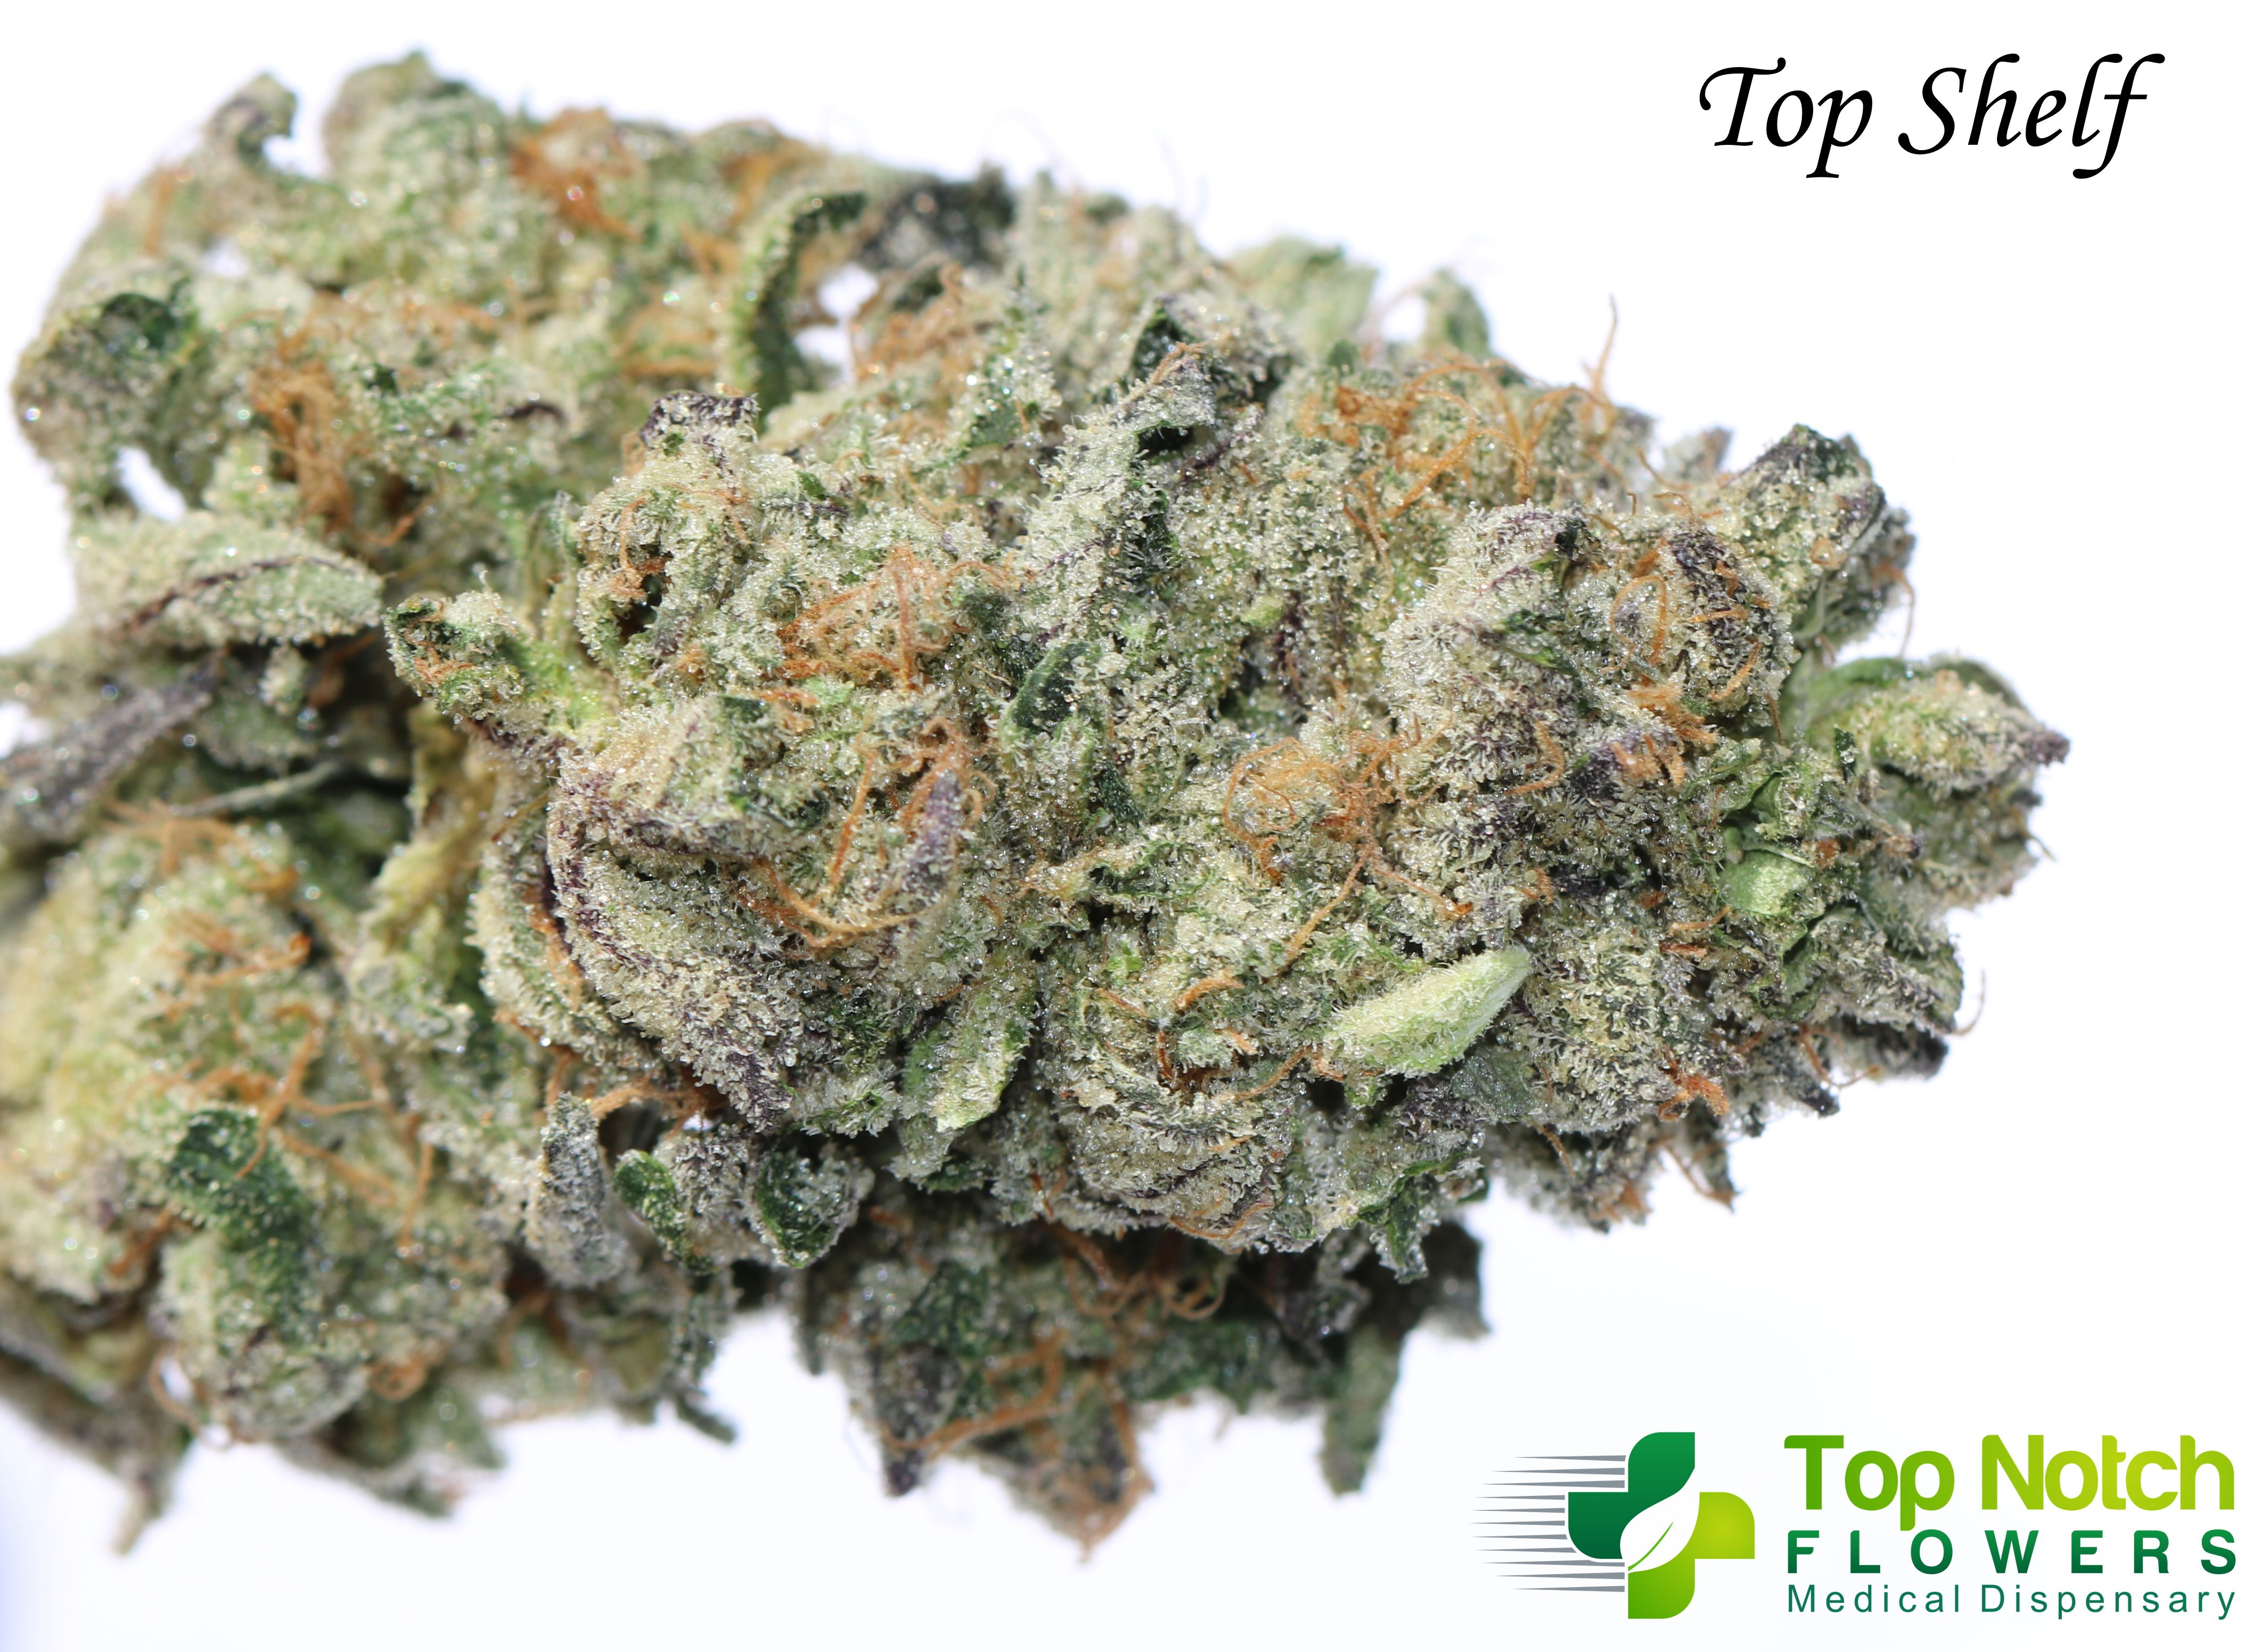 Top Shelf Larry Bird